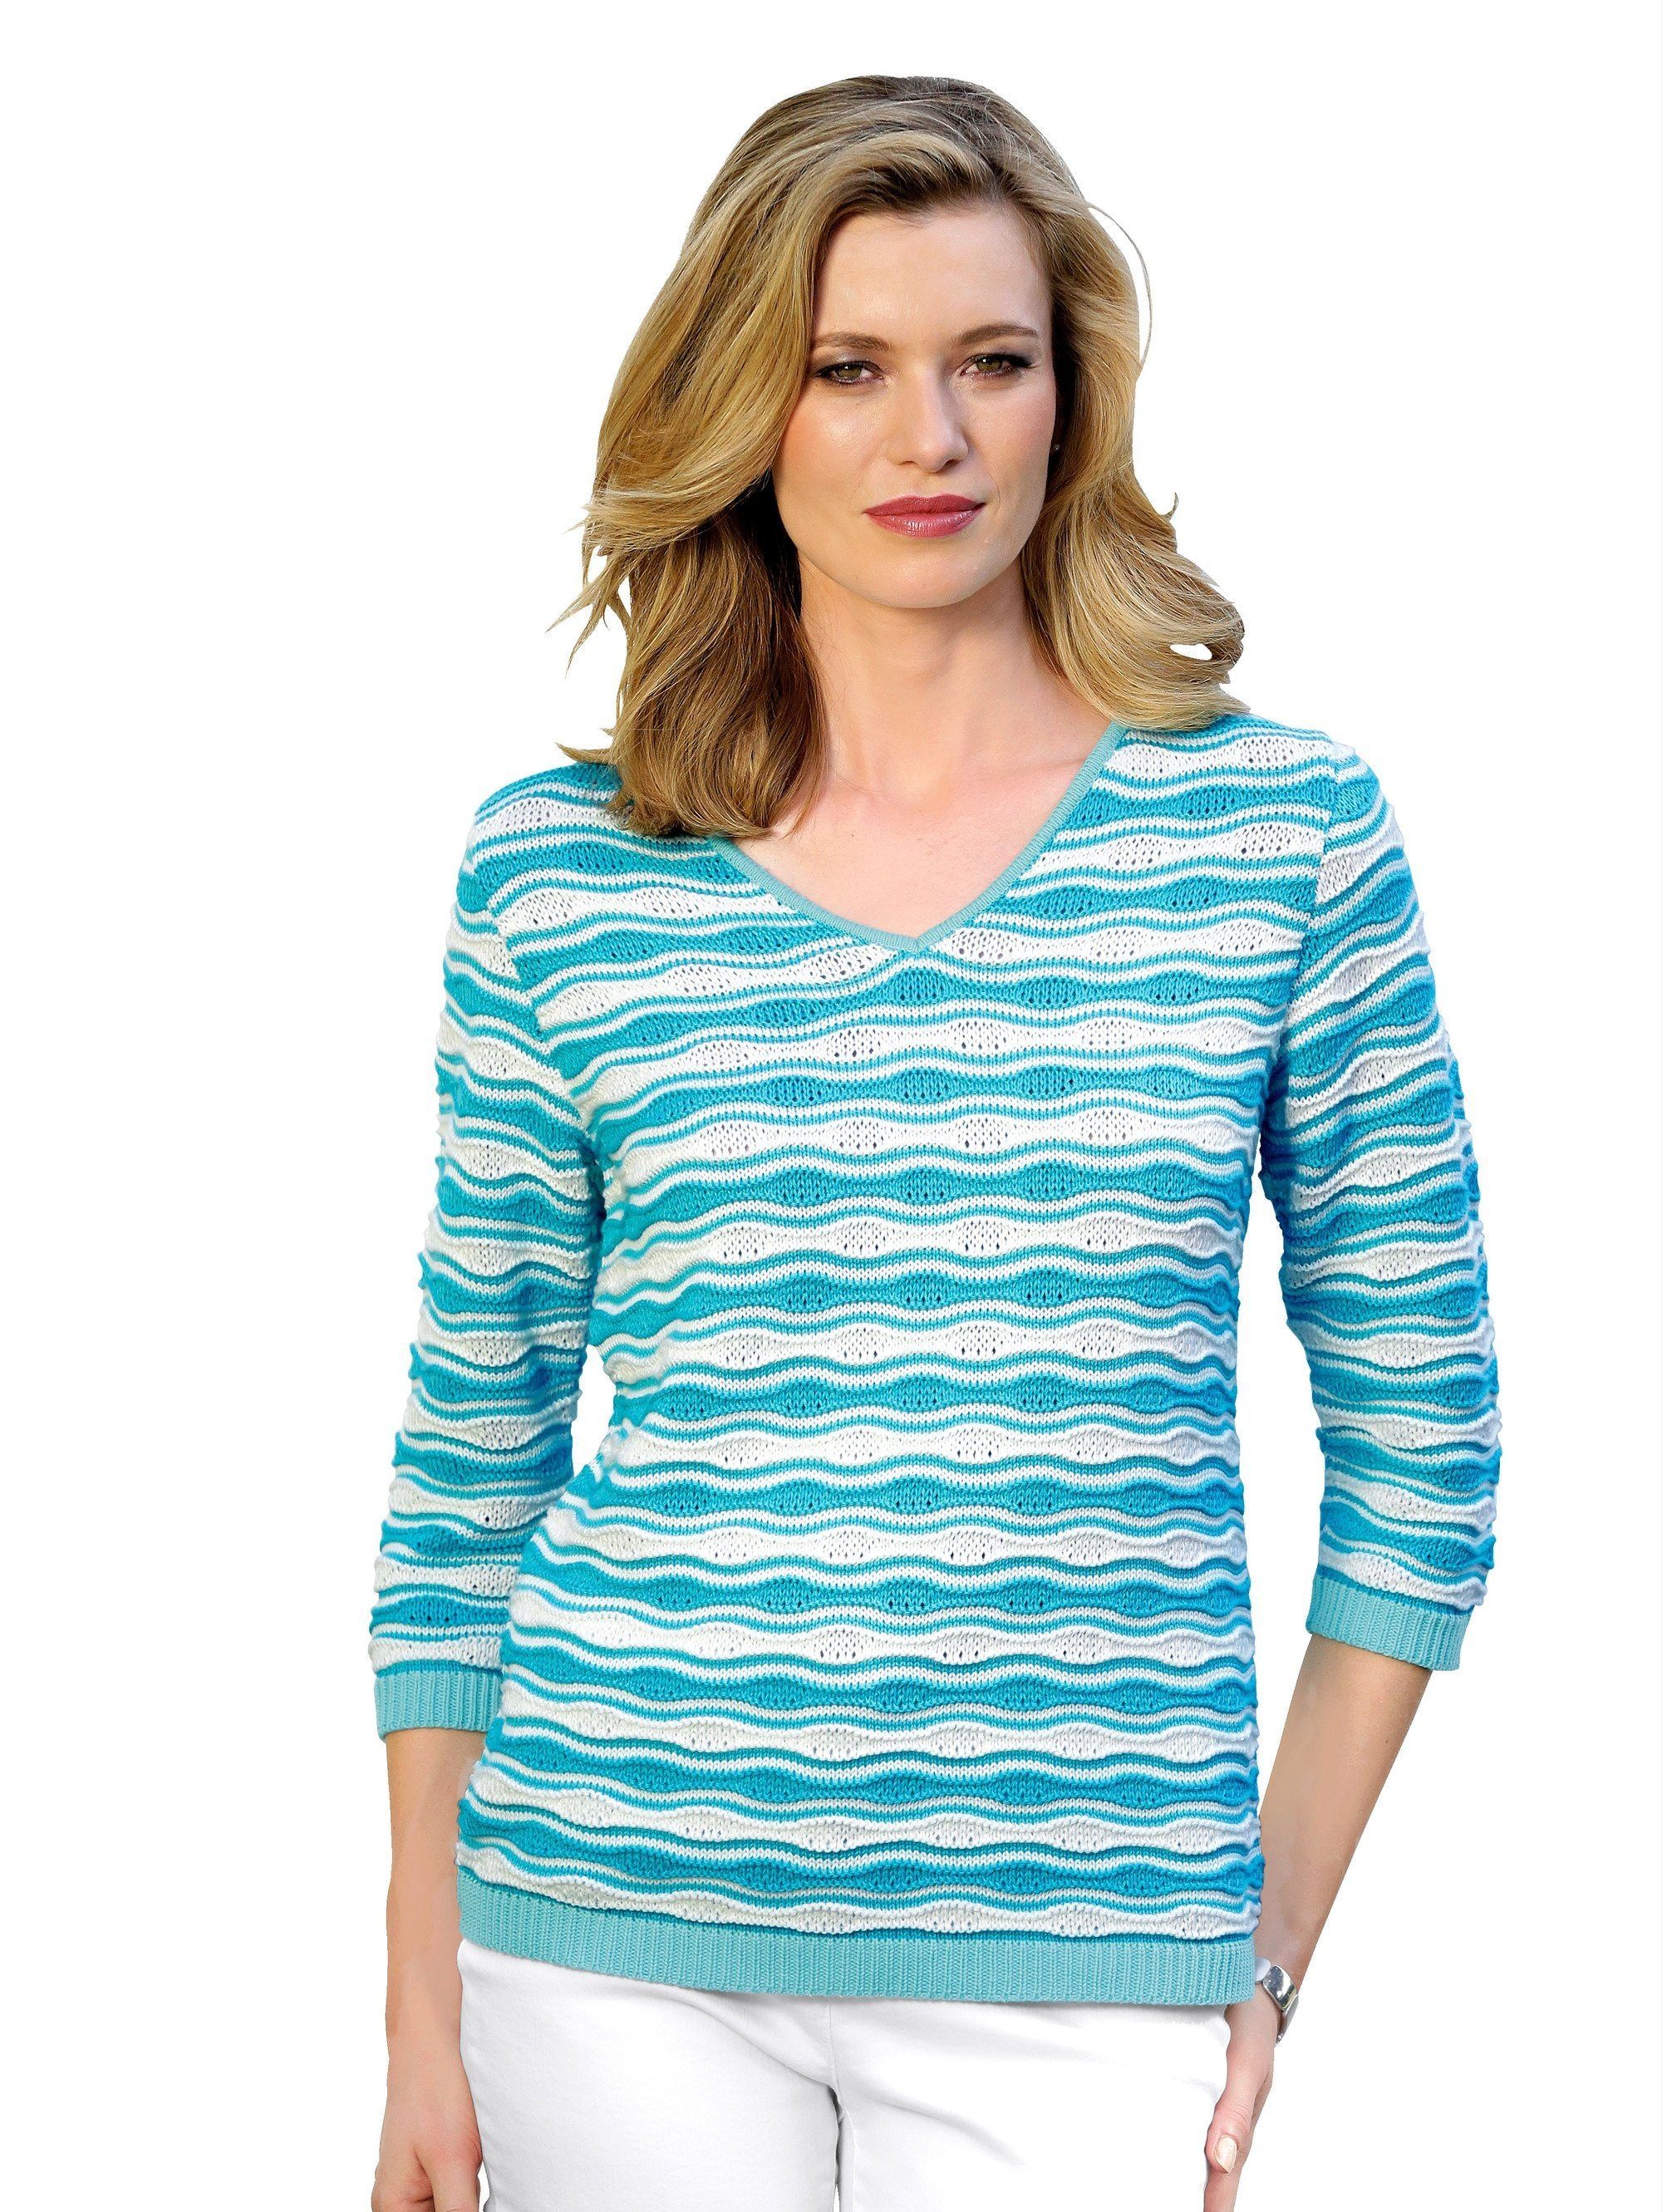 Mona Pullover in Struktur Strick online shoppen | BAUR